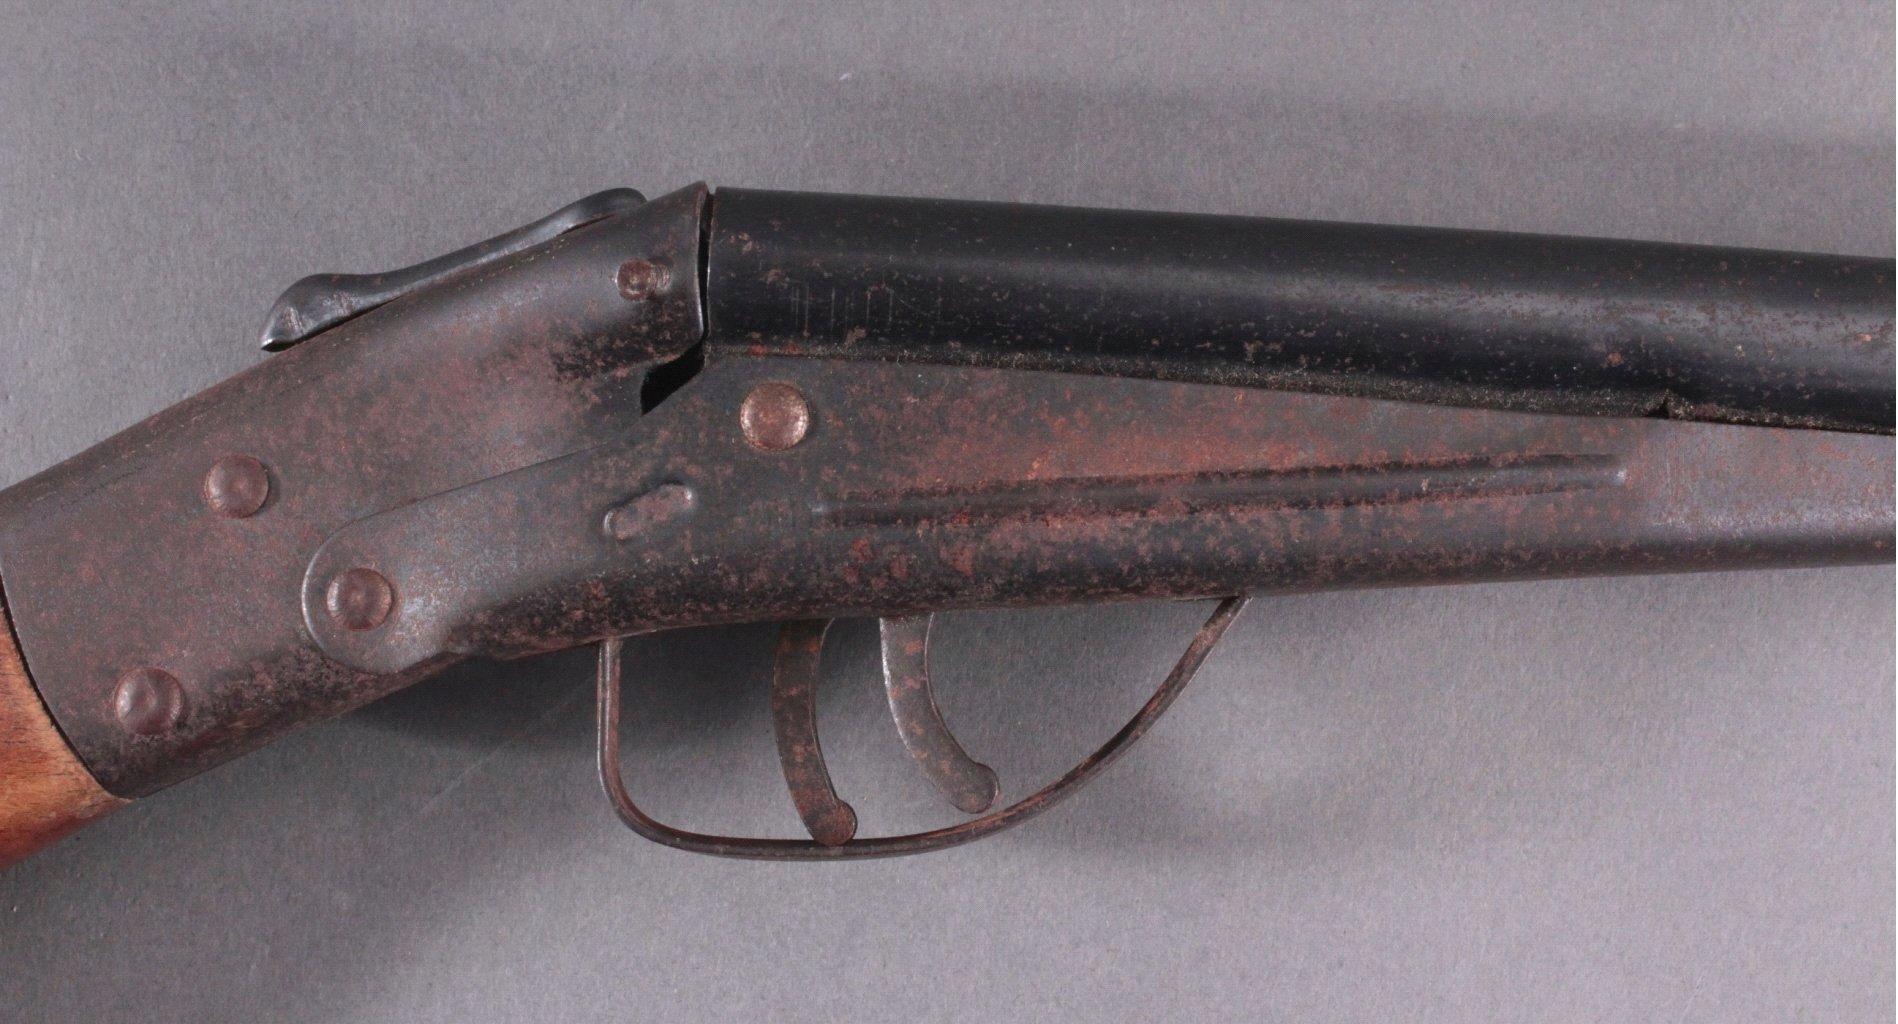 Spielzeuggewehr 1. Hälfte 20. Jh. Doppelflinte-2